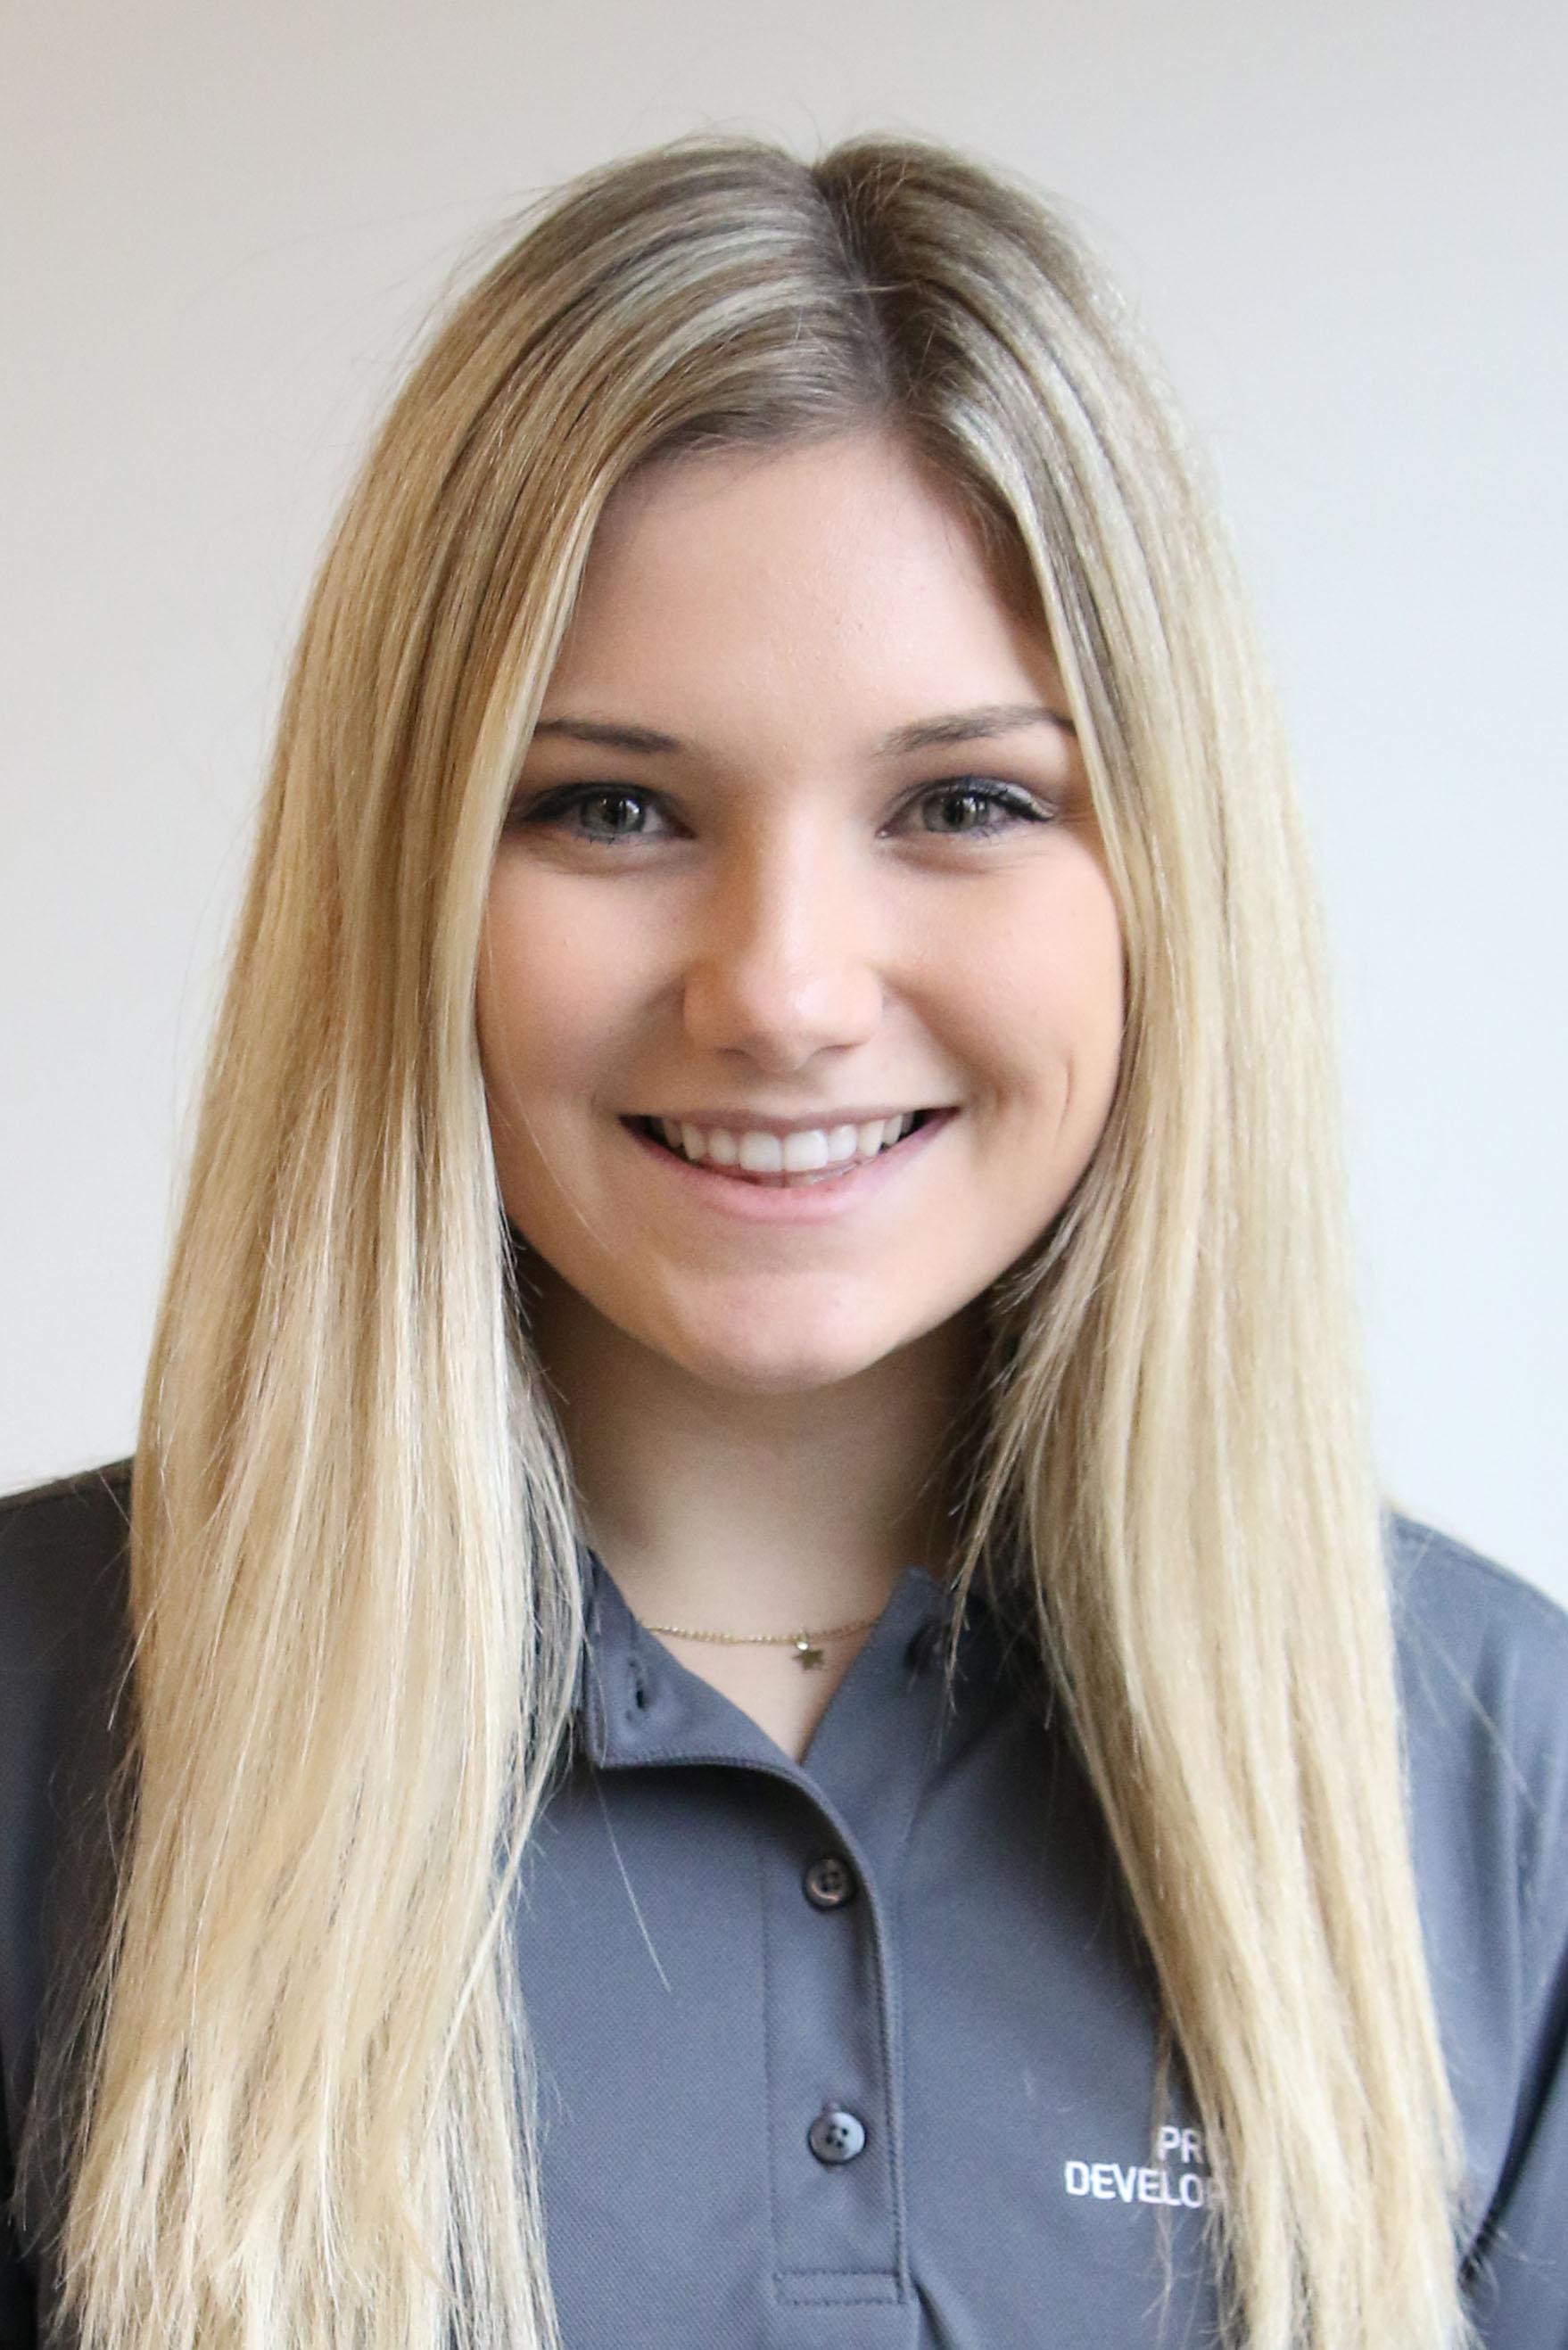 Haley Otts